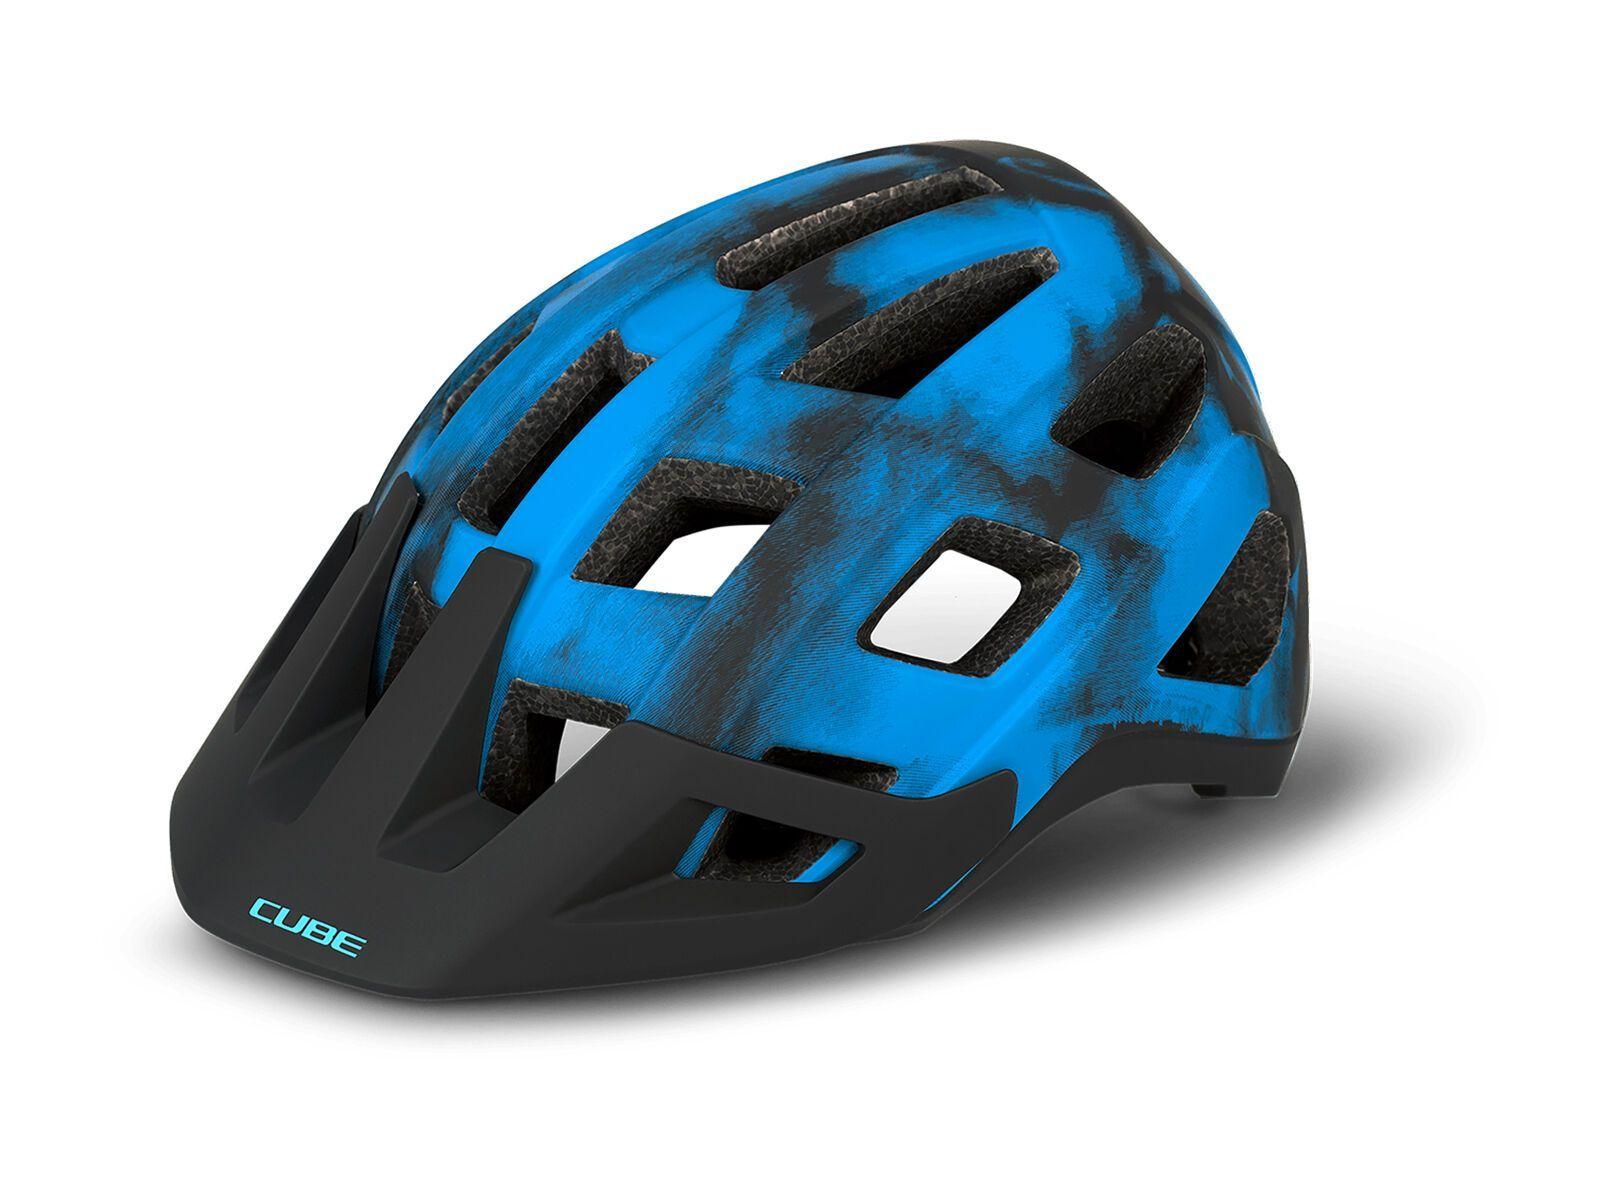 Cube Helm Badger blue M // 56-59 cm 162410287